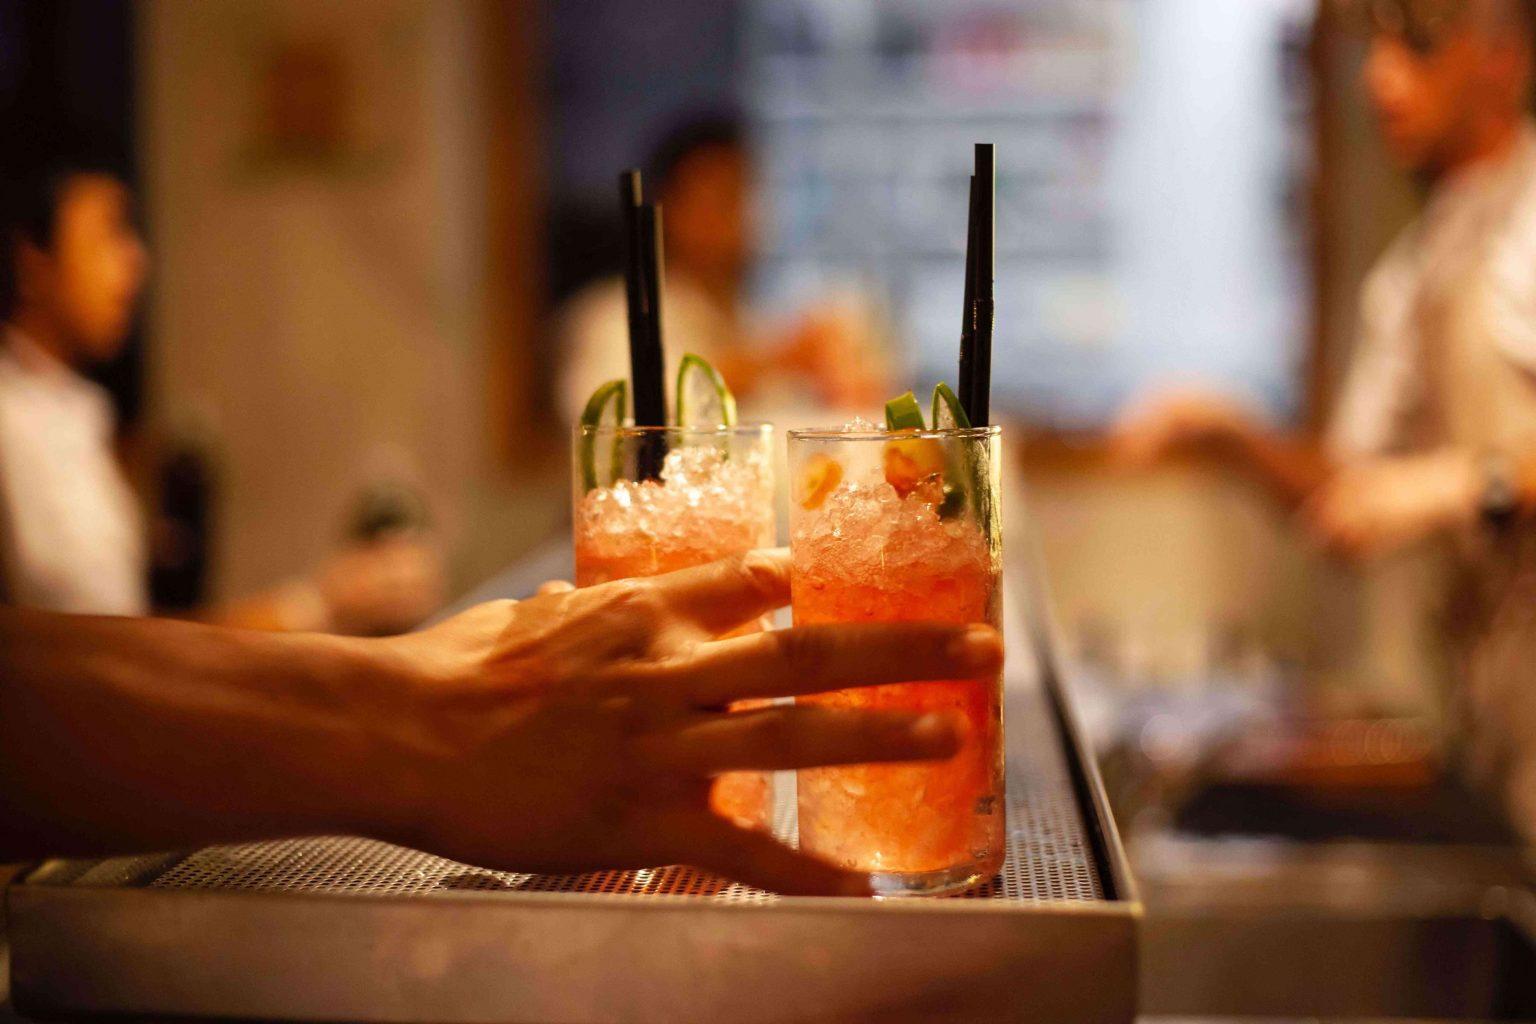 sweetened-juice-drinks